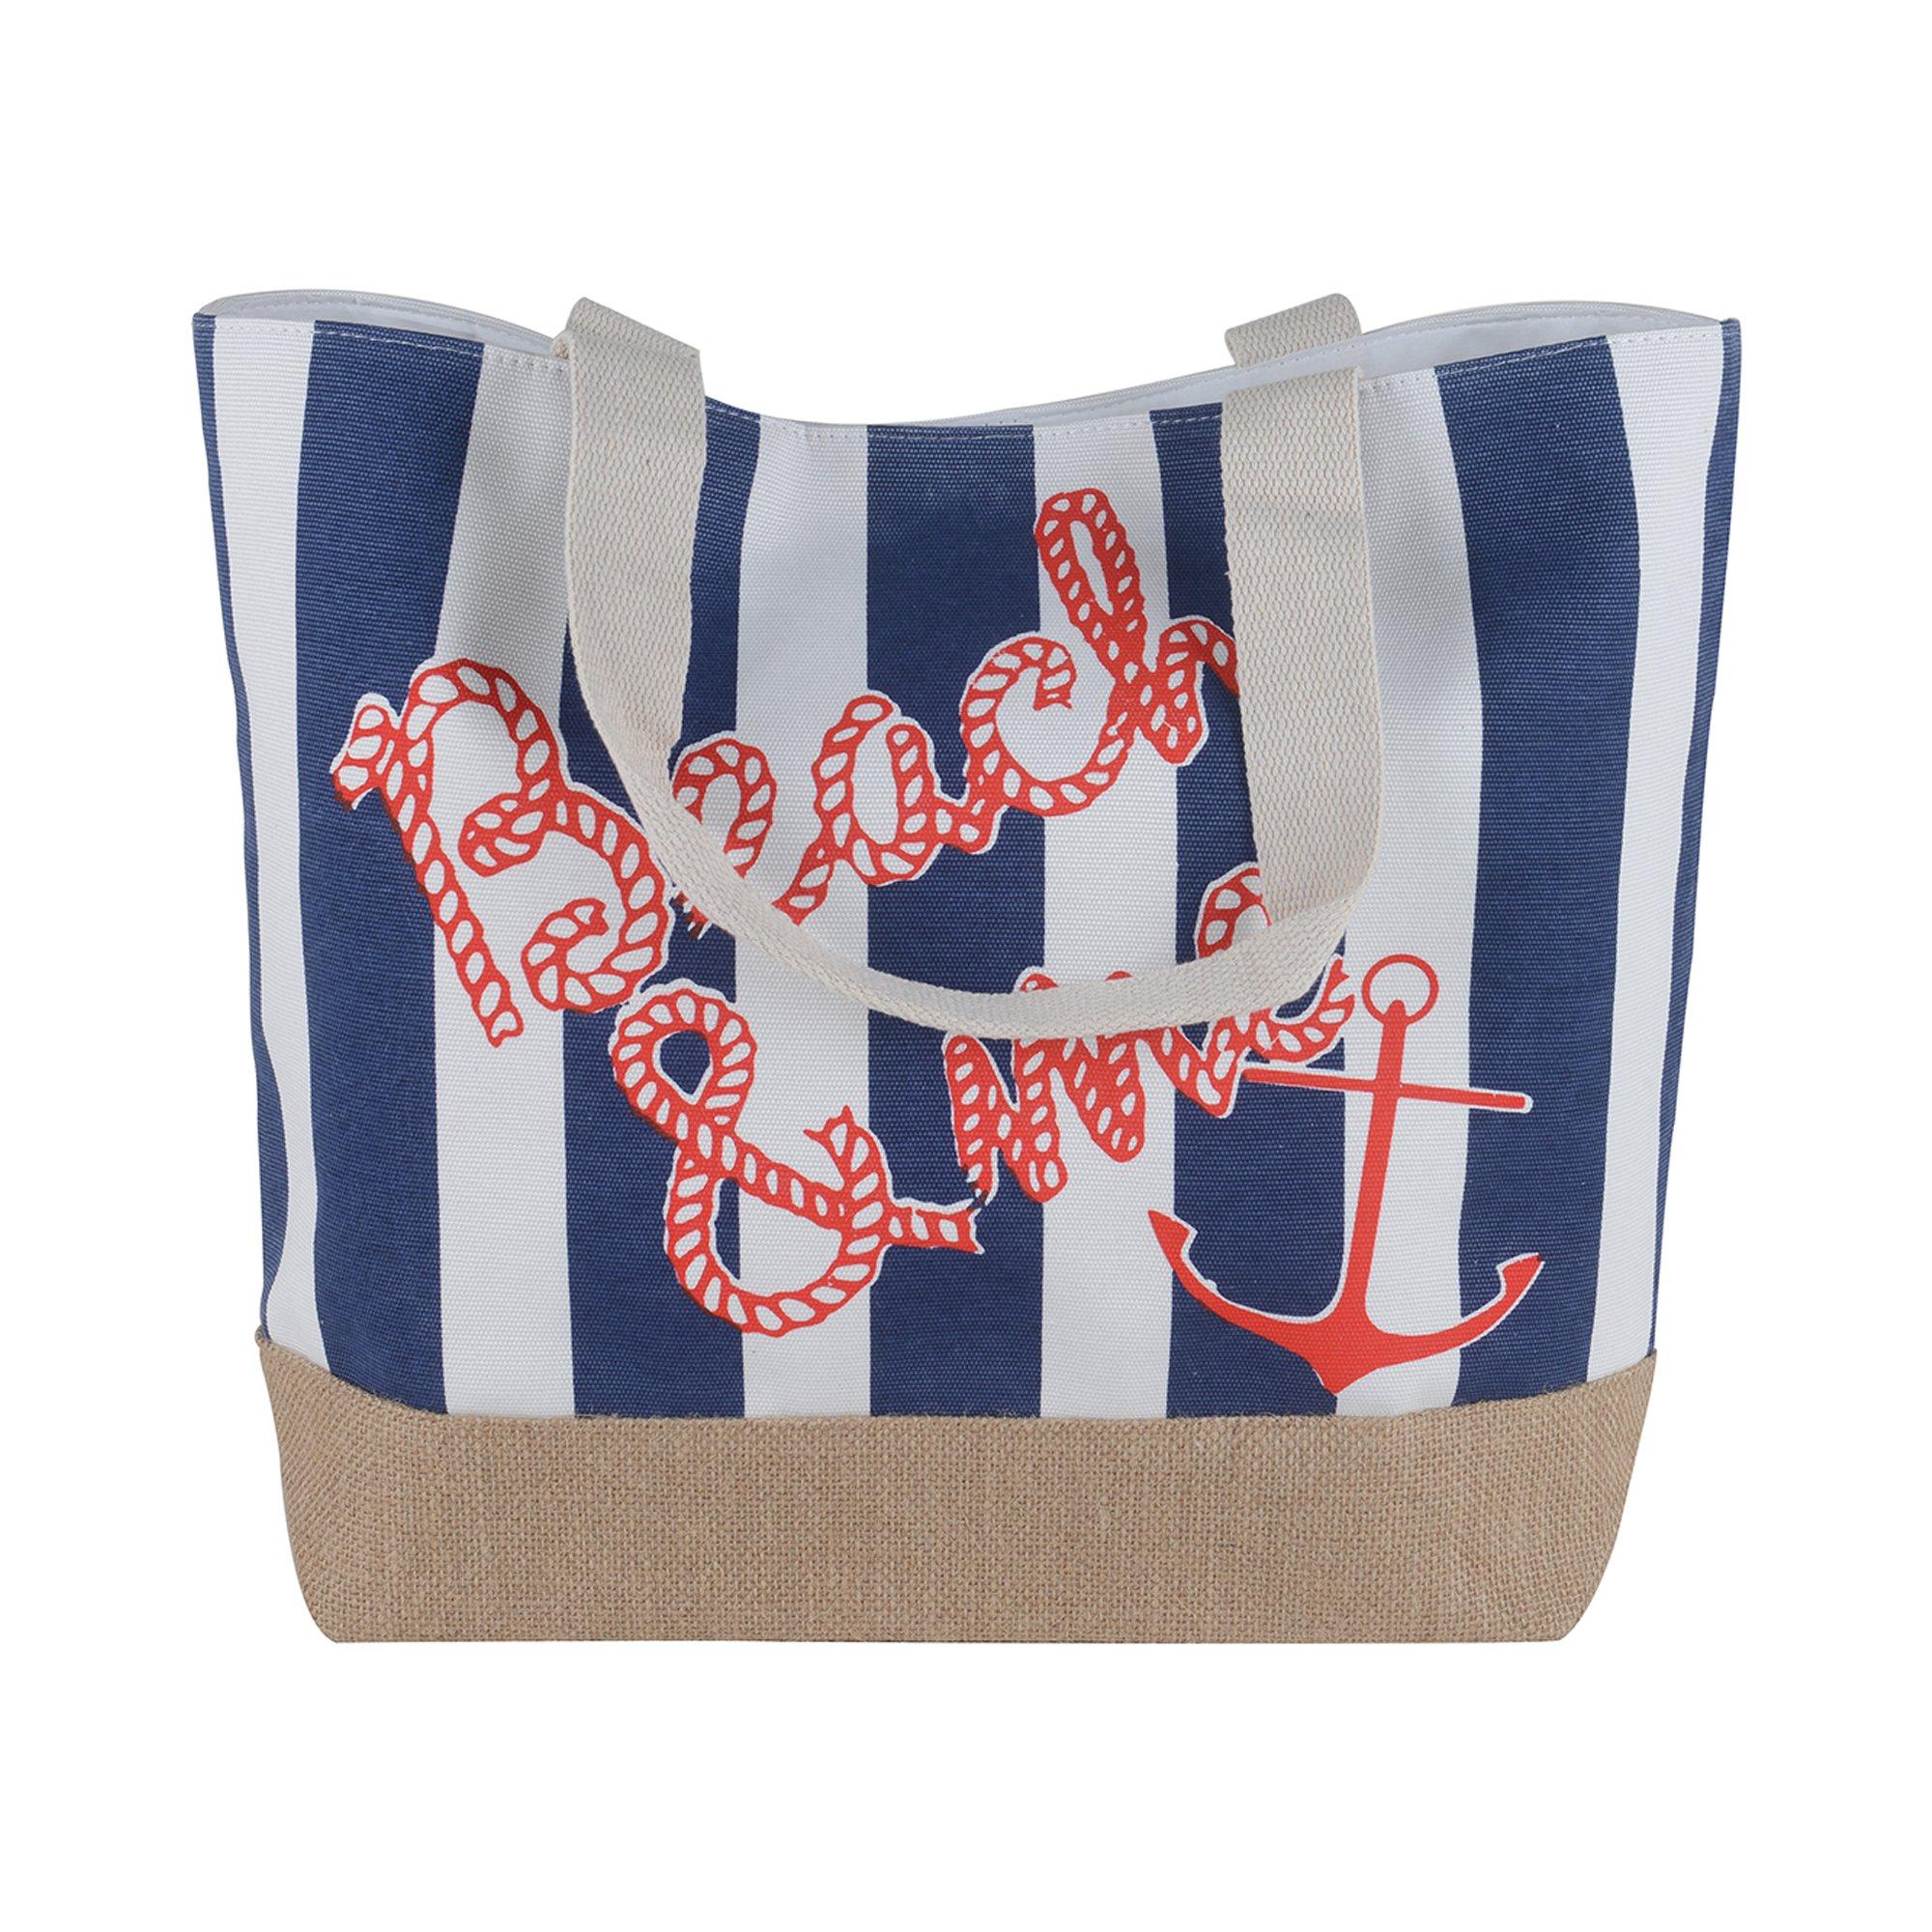 Canvas Burlap Beach & Me Printed Cotton Heavy Shoulder Straps Premium Women Tote Bag by BB (Navy Blue) by BB (Image #1)